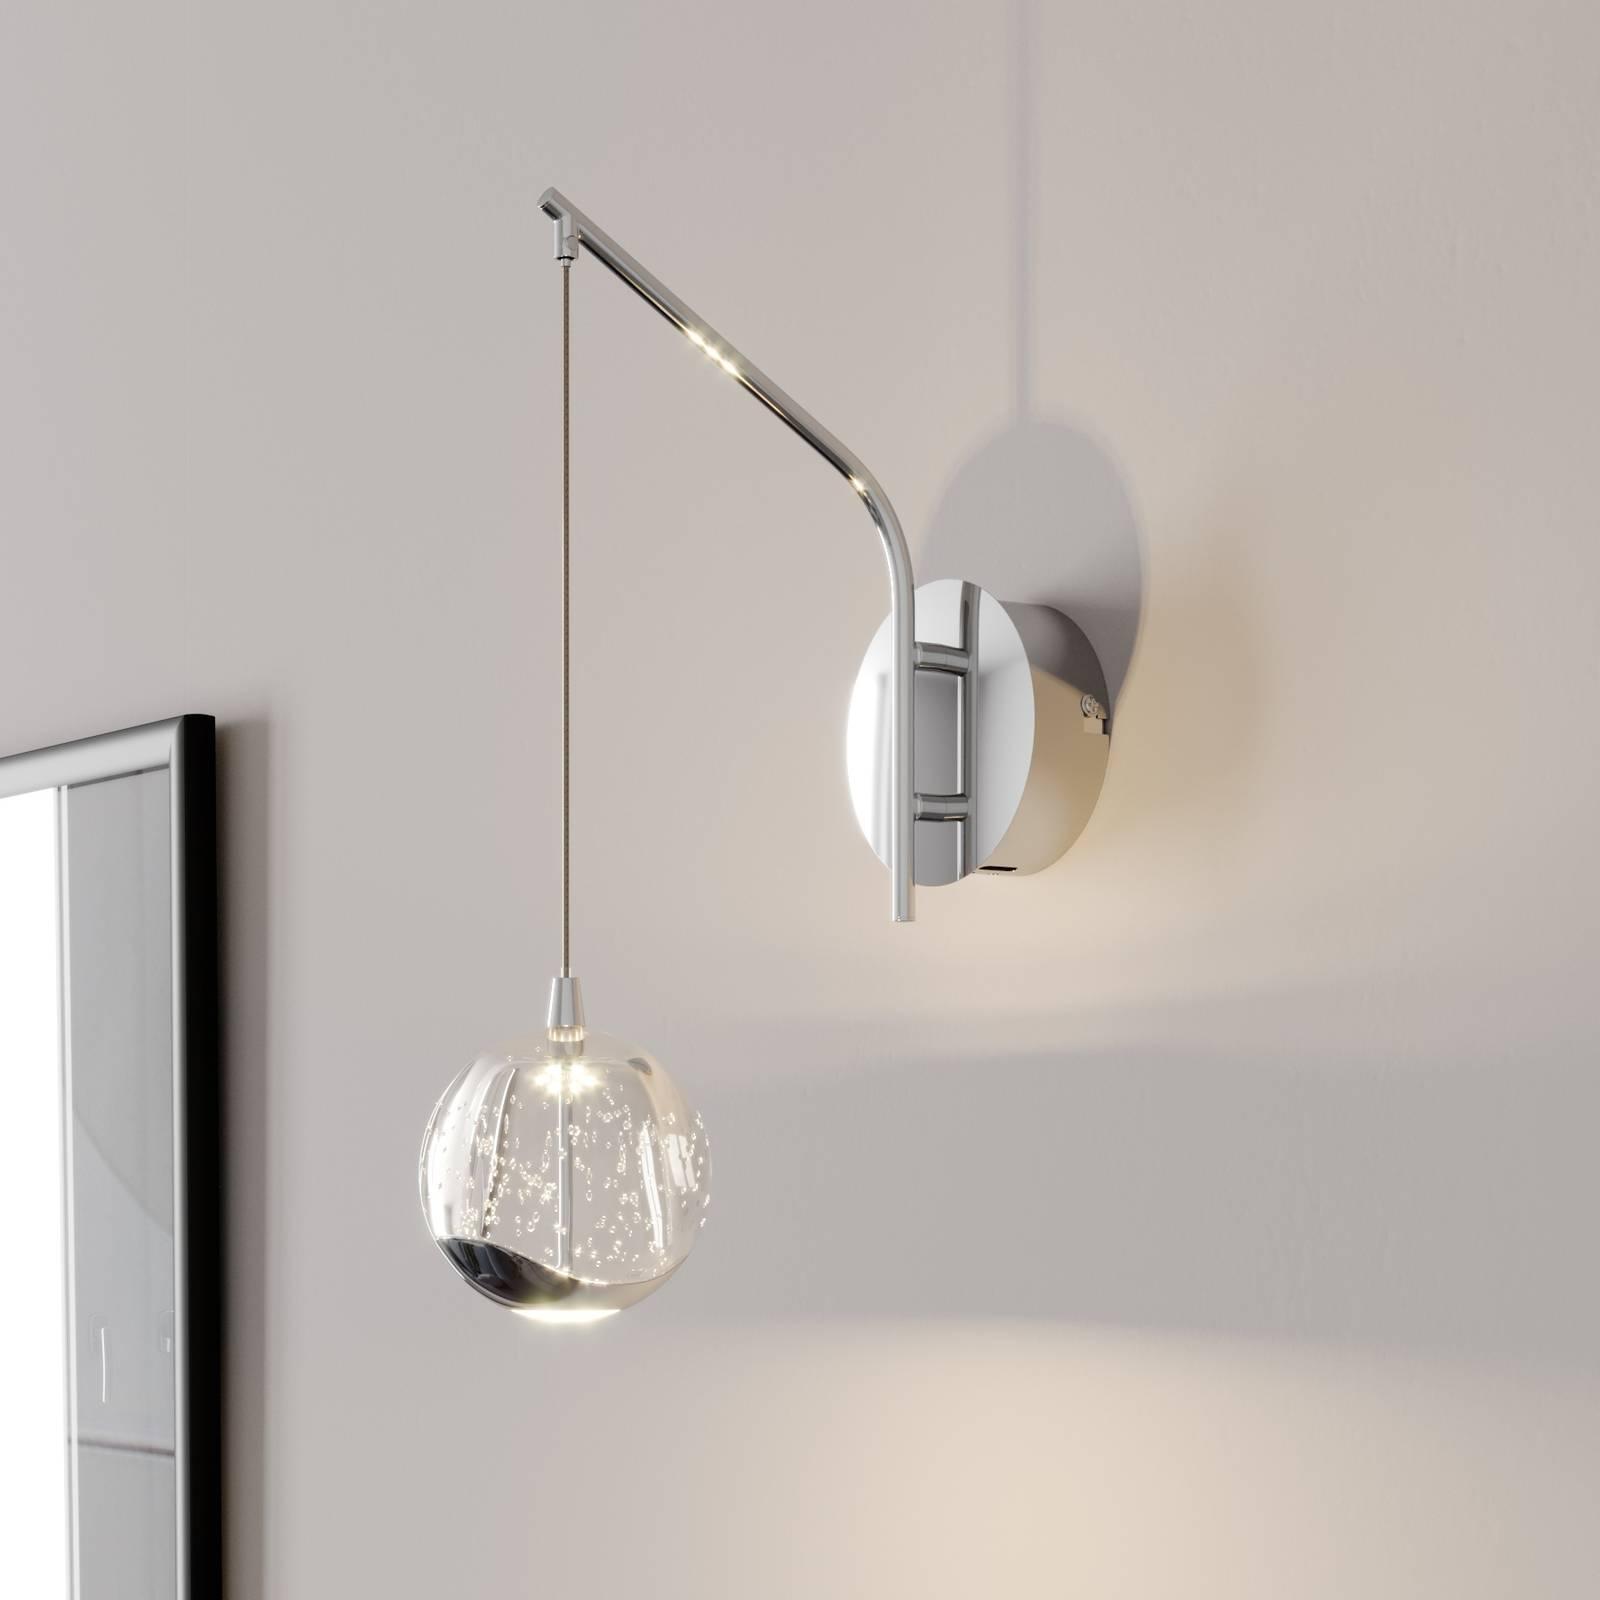 LED wandlamp Hayley m. hangende bol, chroom